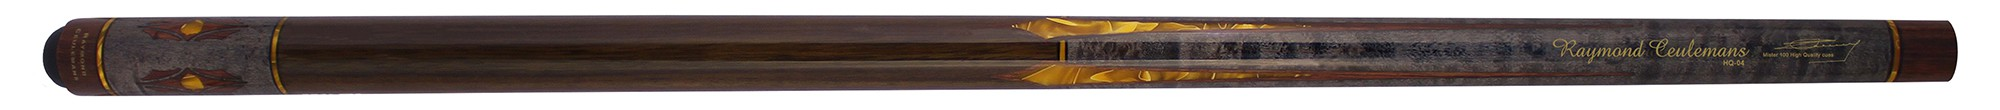 Raymond Ceulemans ® keu, HQ-04 inclusief extra top